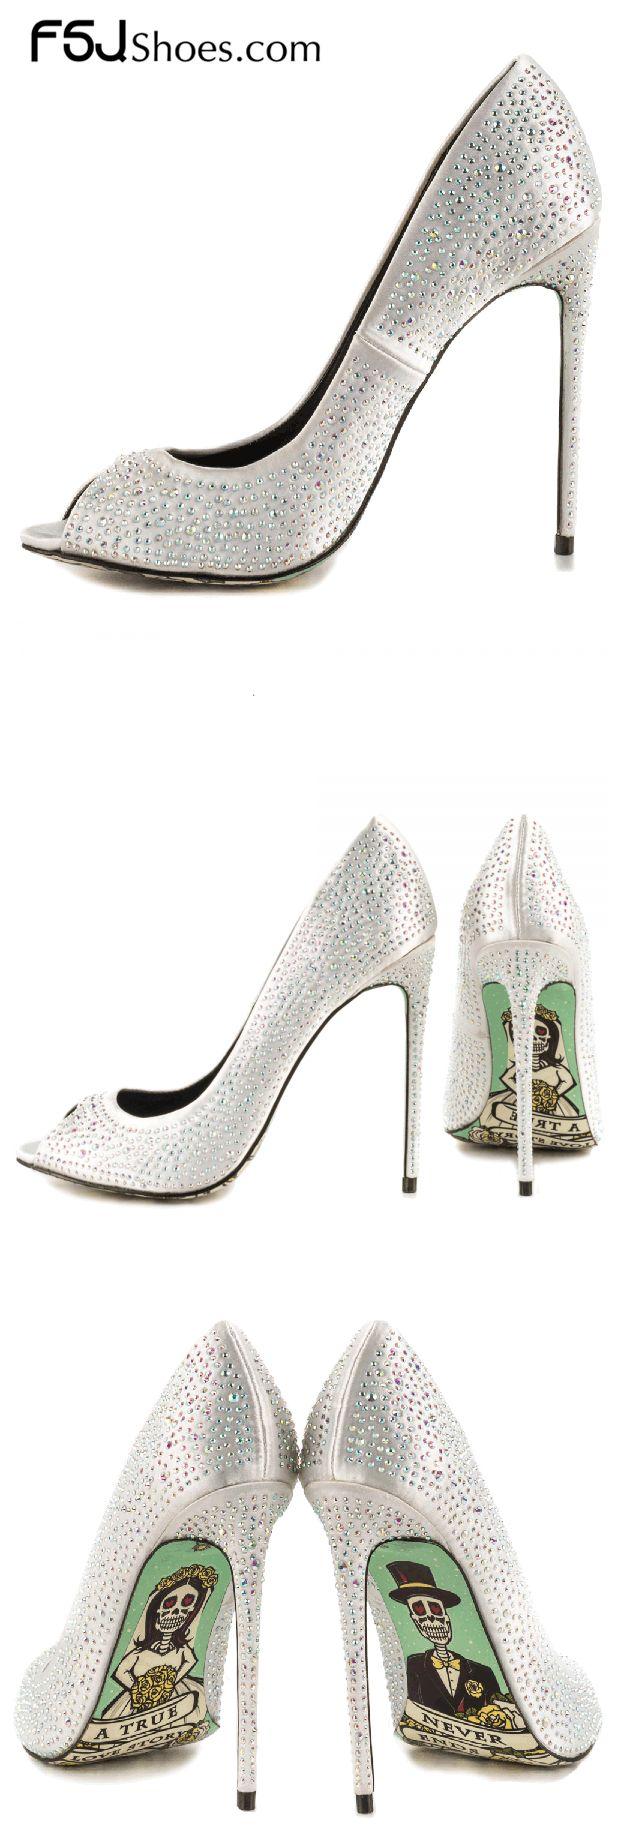 Women's Wedding Shoes Winter Fashion Wedding Ideas Women's Silver Glitter Peep Toe Stiletto Heels Wedding Shoes with Scrawling Print Winter Fashion Wedding Ideas Christmas Outfit Casual| FSJ